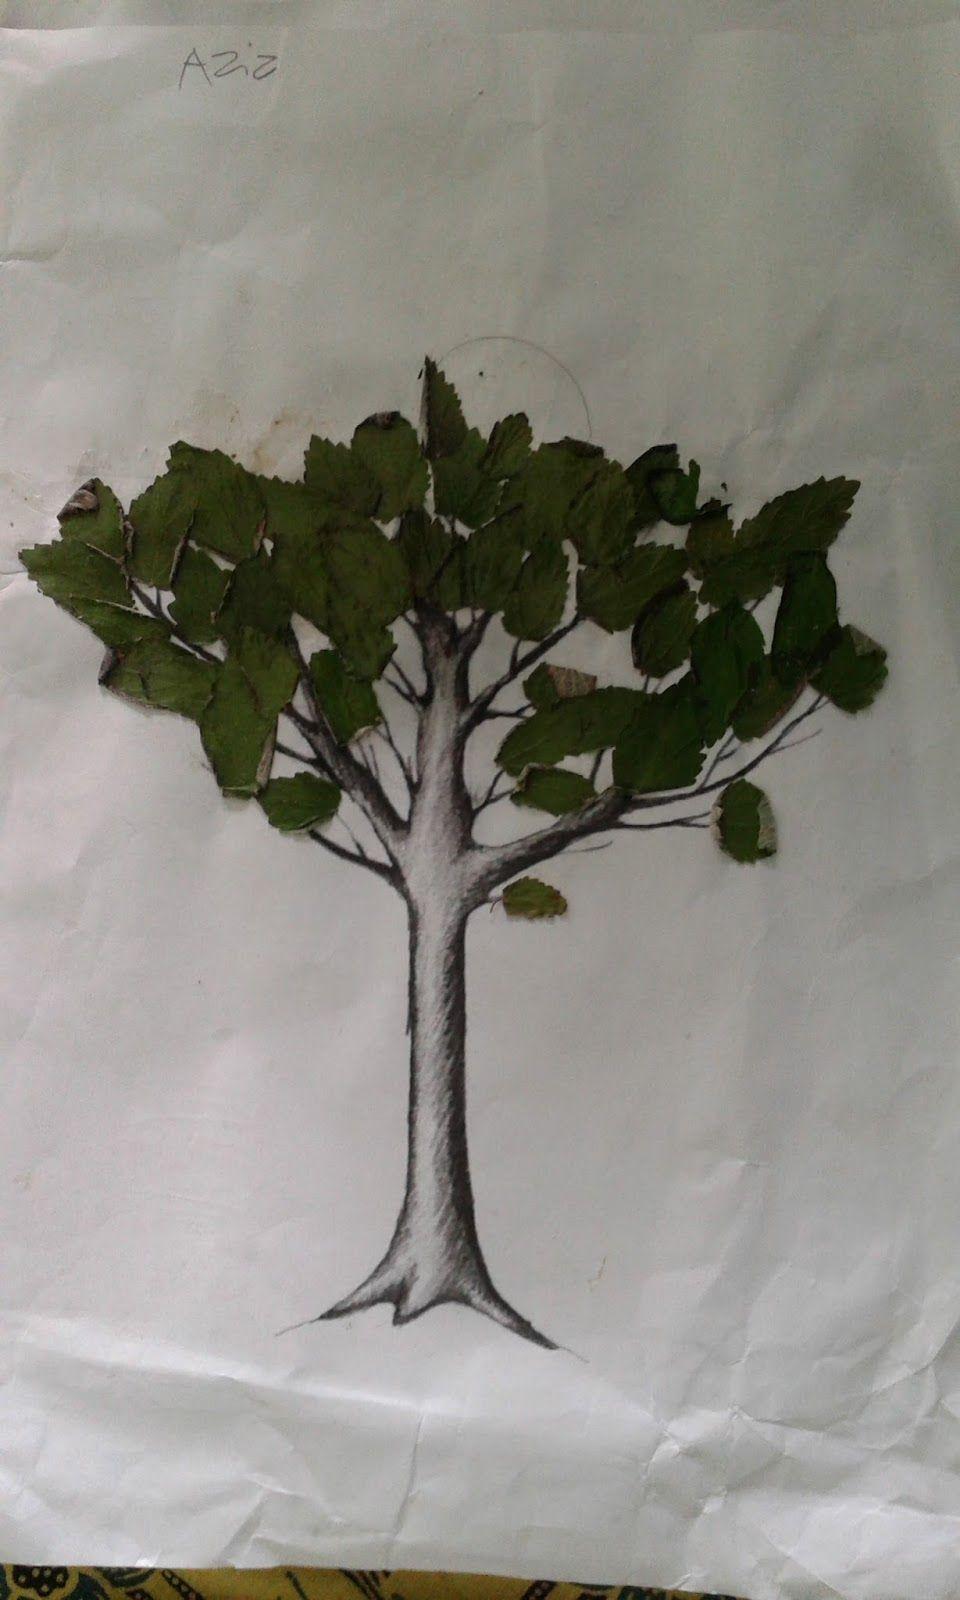 Gambar Kolase Pohon Dari Daun Kering Kolase, Gambar, Bunga